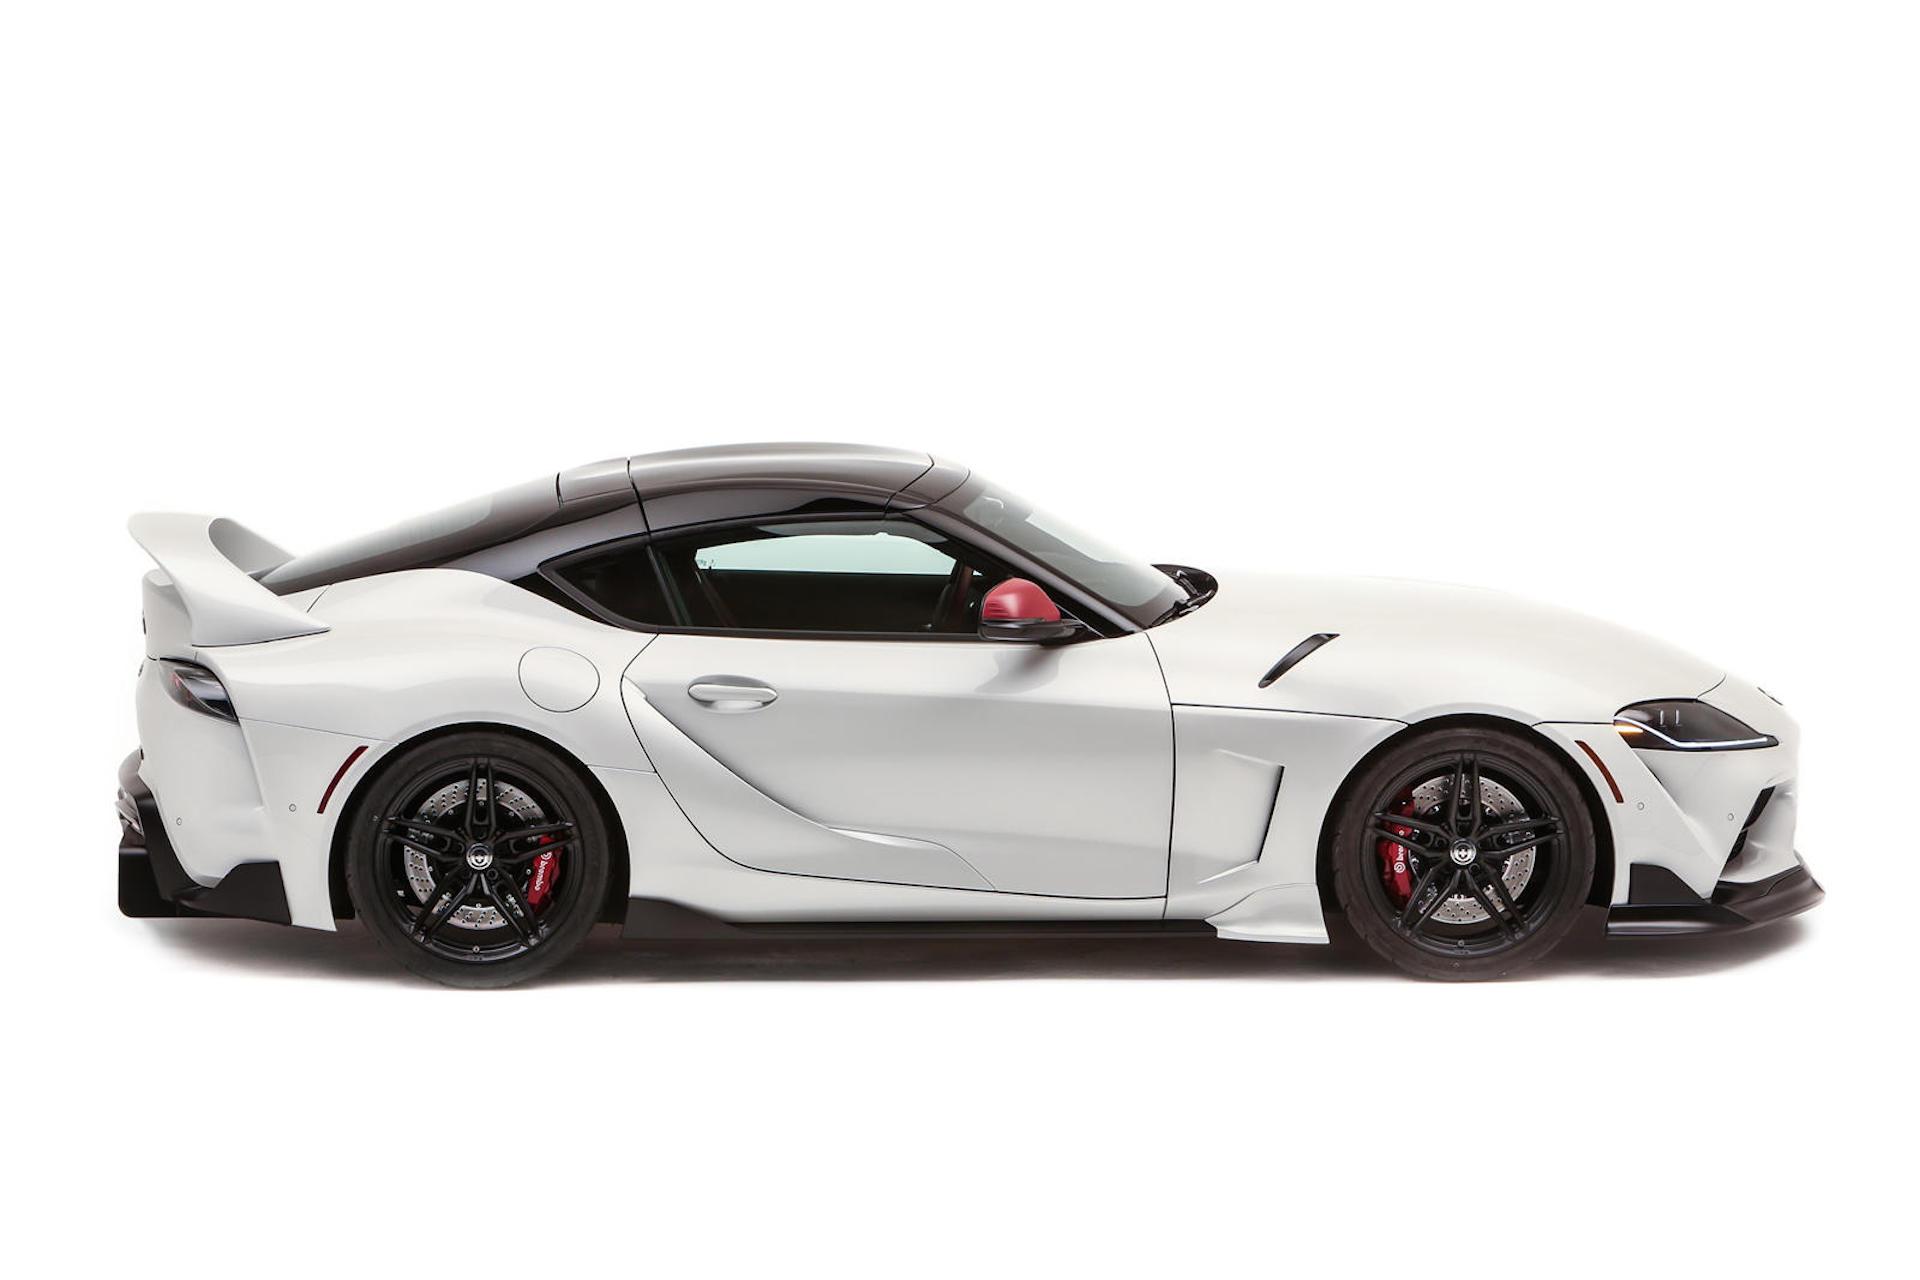 Toyota Gr Supra Sport Top Targa Sema 12